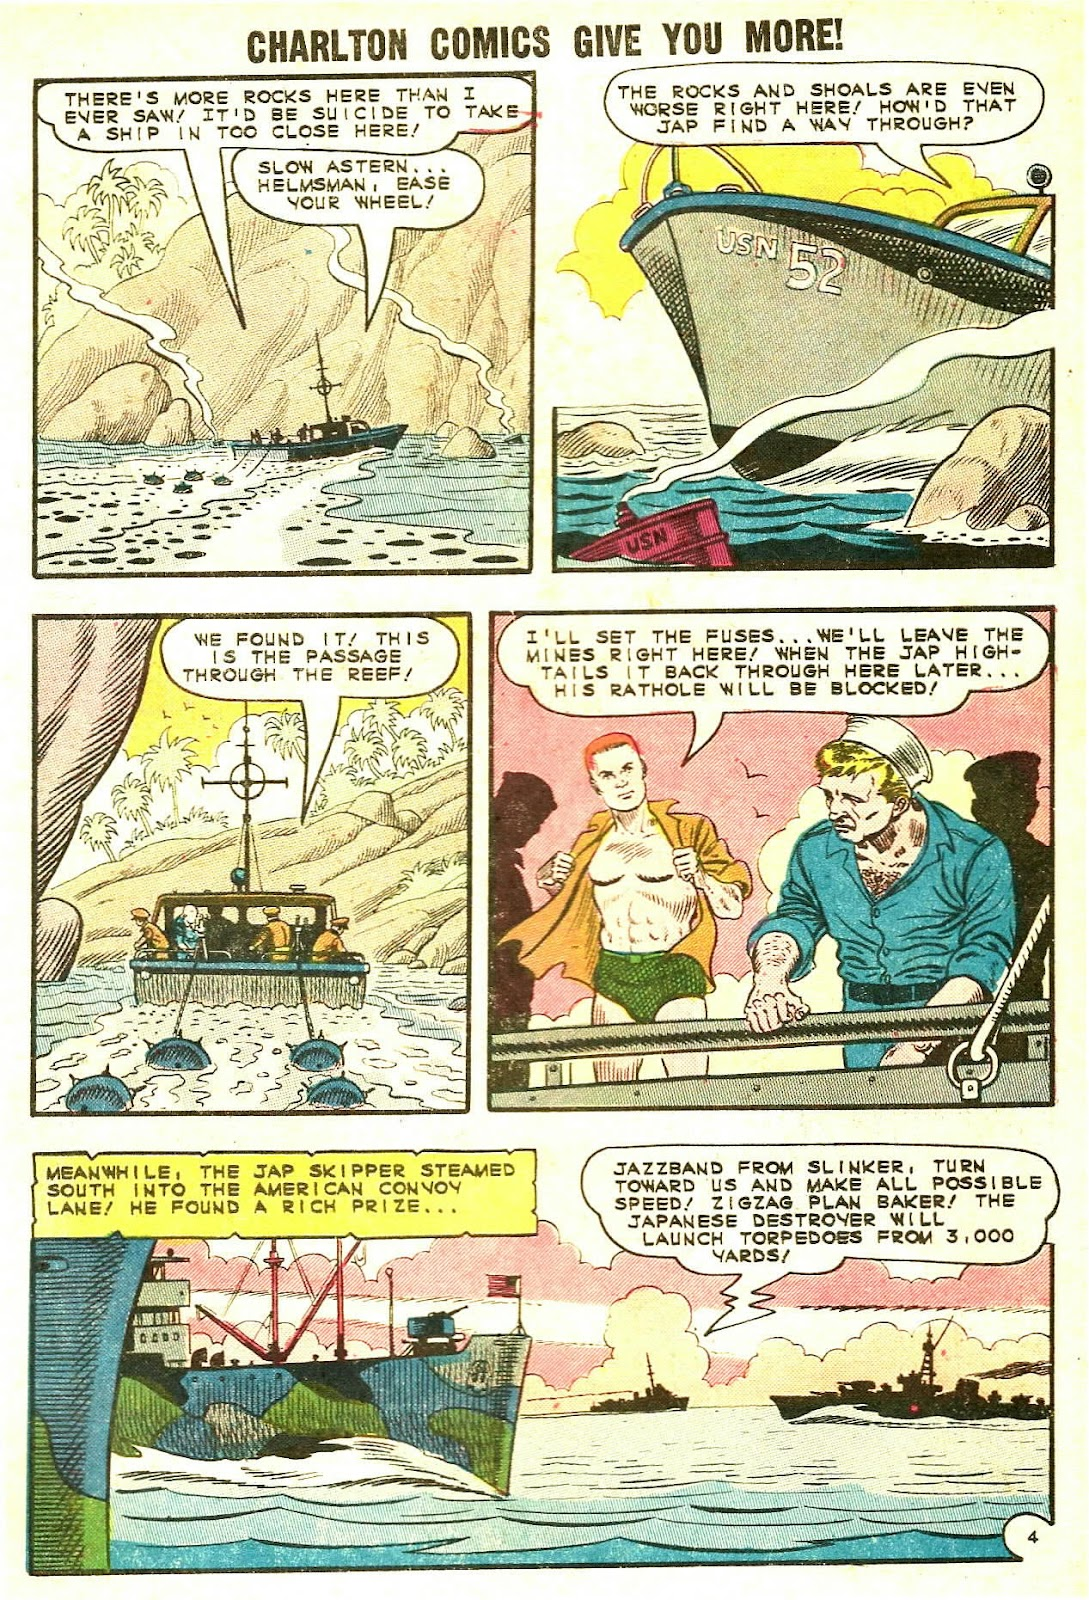 Read online Fightin' Navy comic -  Issue #120 - 7